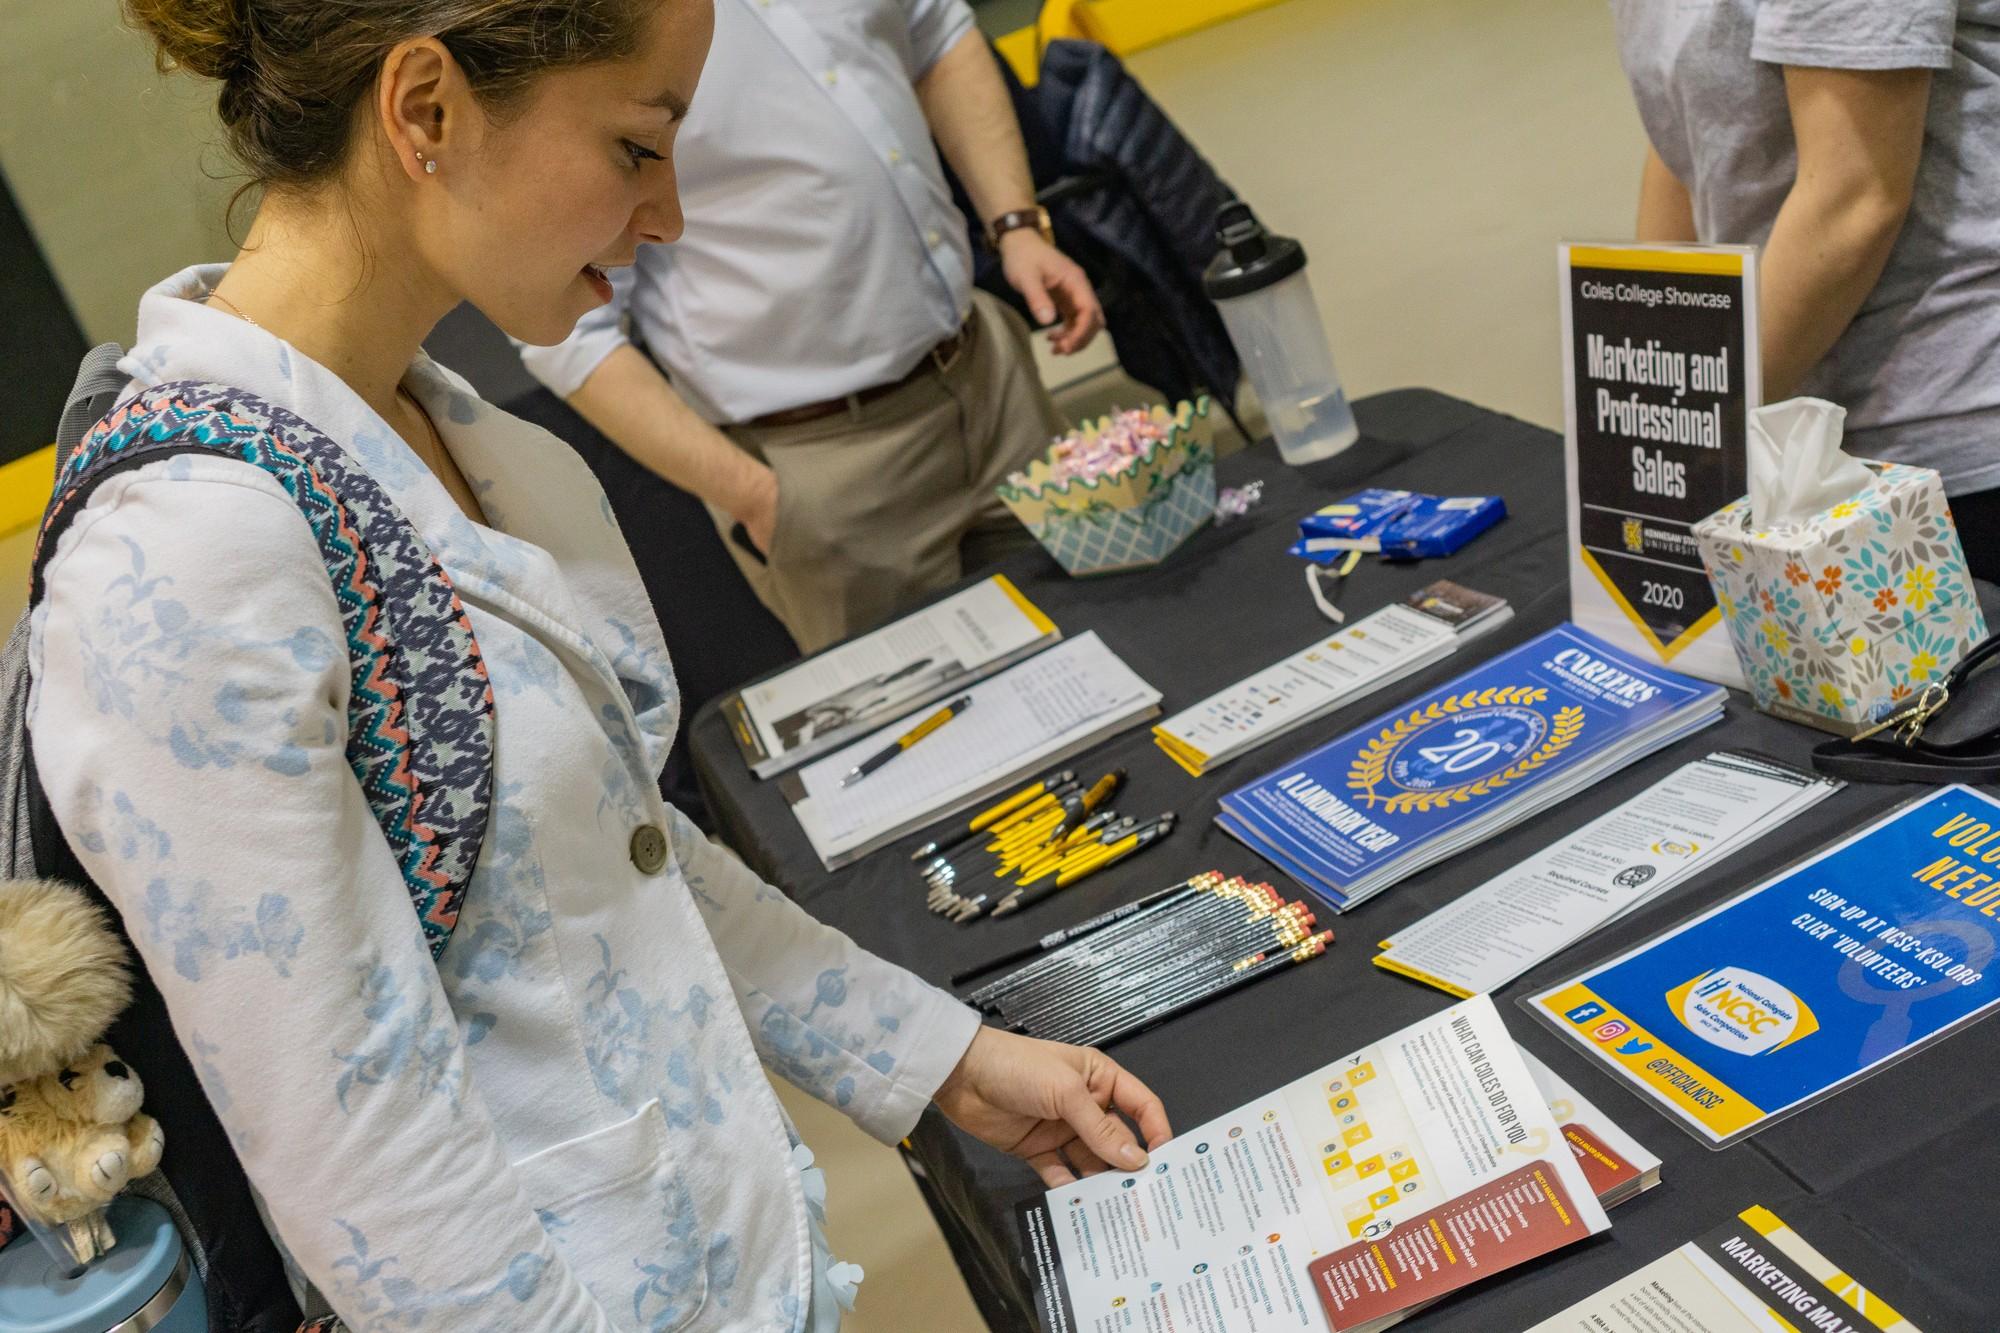 KSU holds first Coles College Showcase